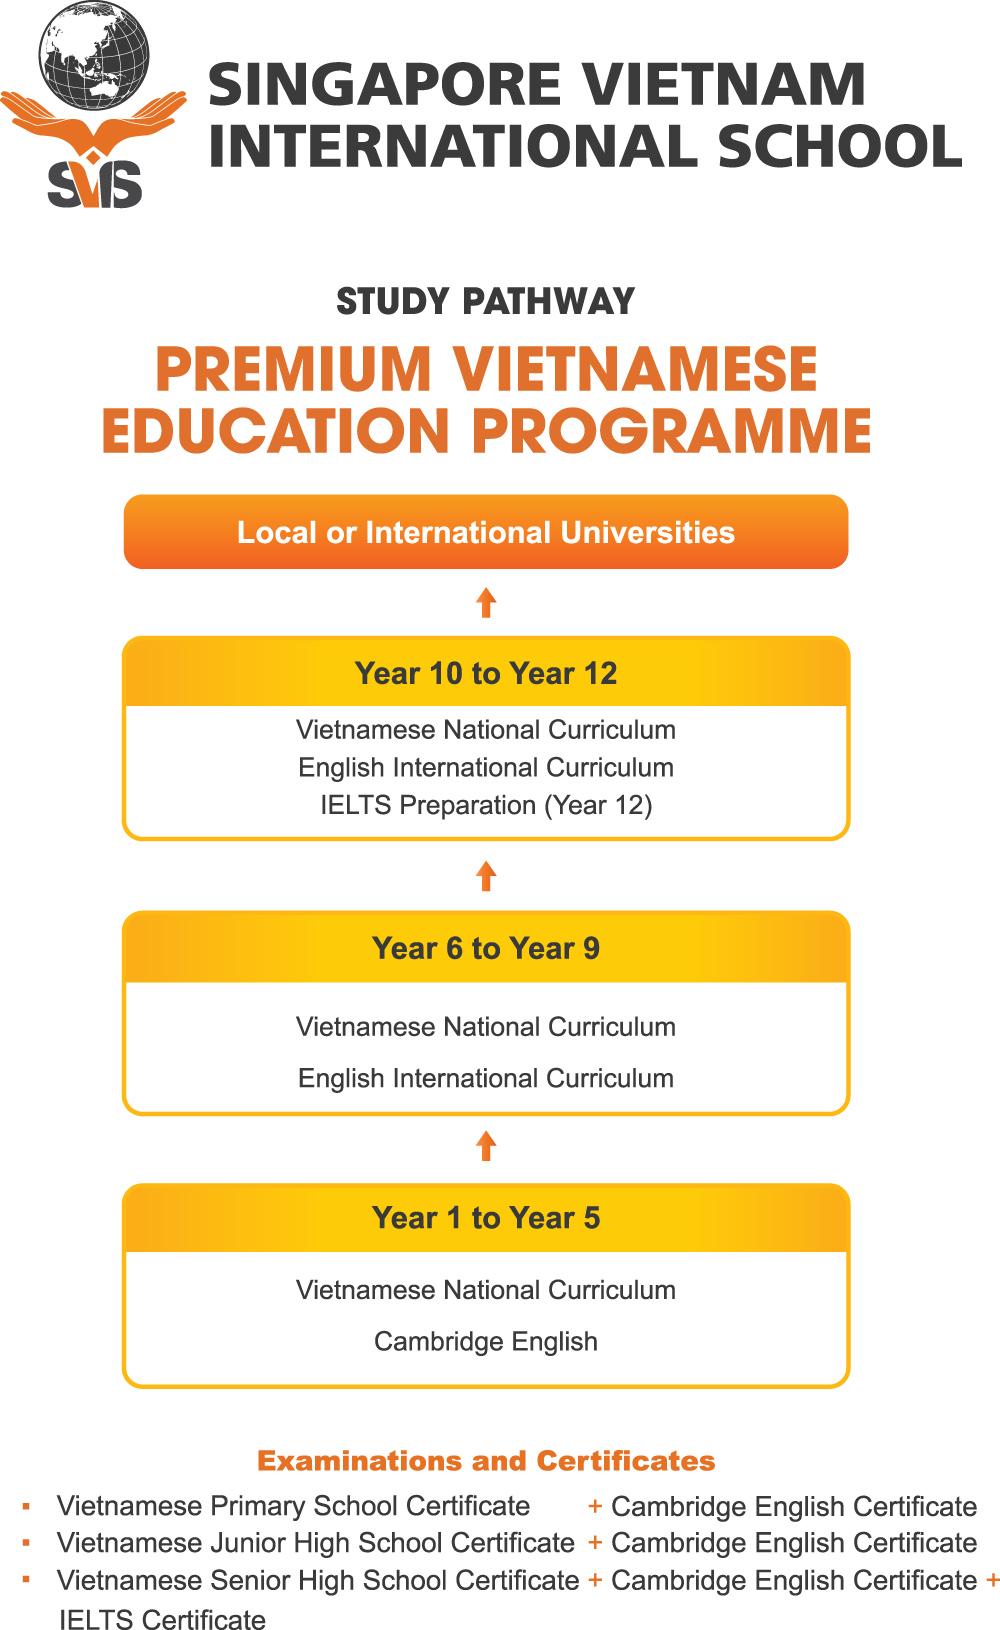 Study-Pathway-SVIS-Nha-Trang-EN